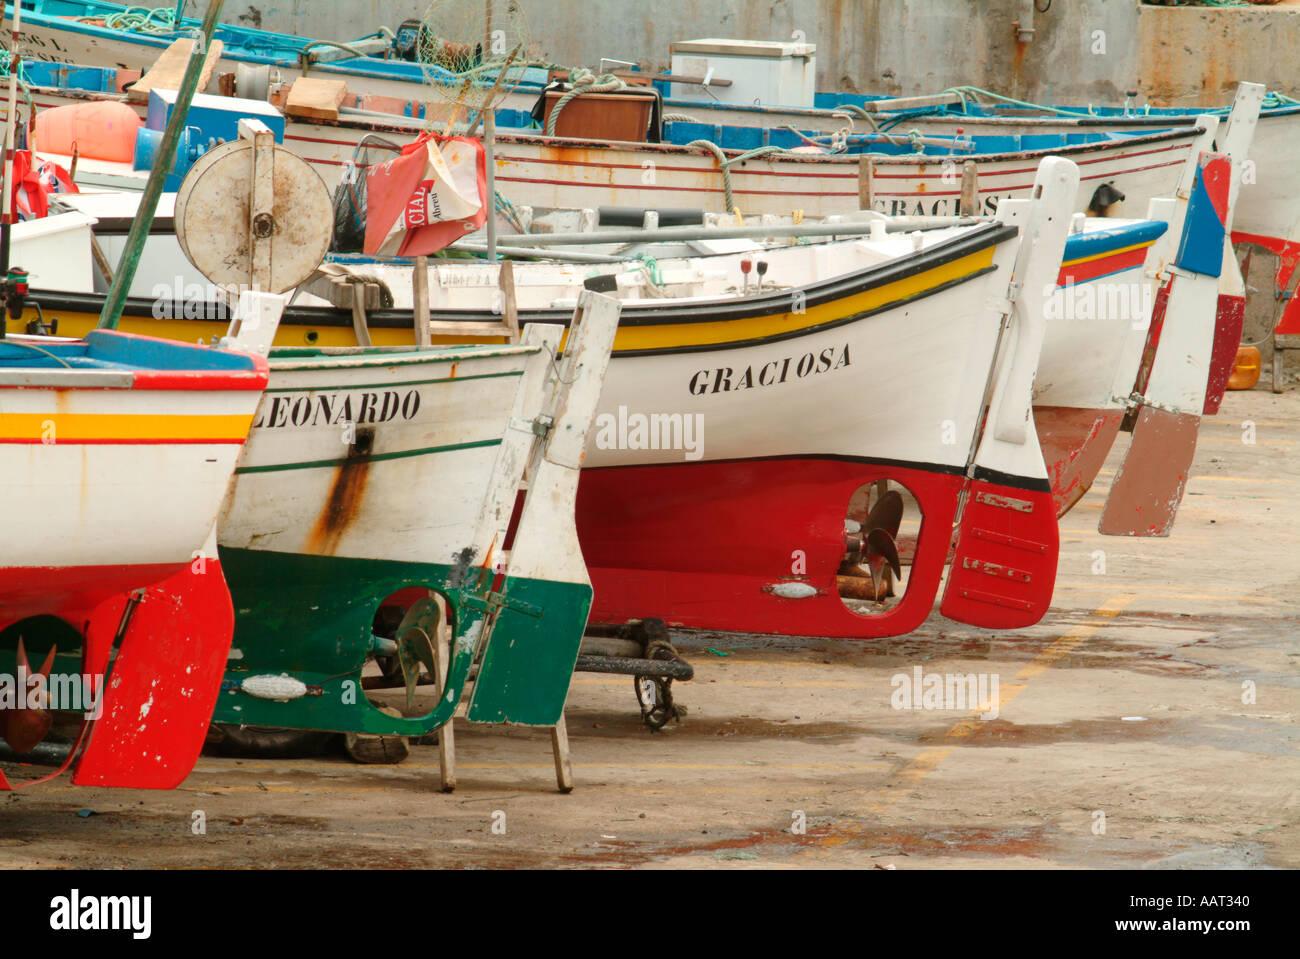 Bunte traditionelle bemalten Fischerboote im Graciosa, Azoren, Portugal. Stockbild